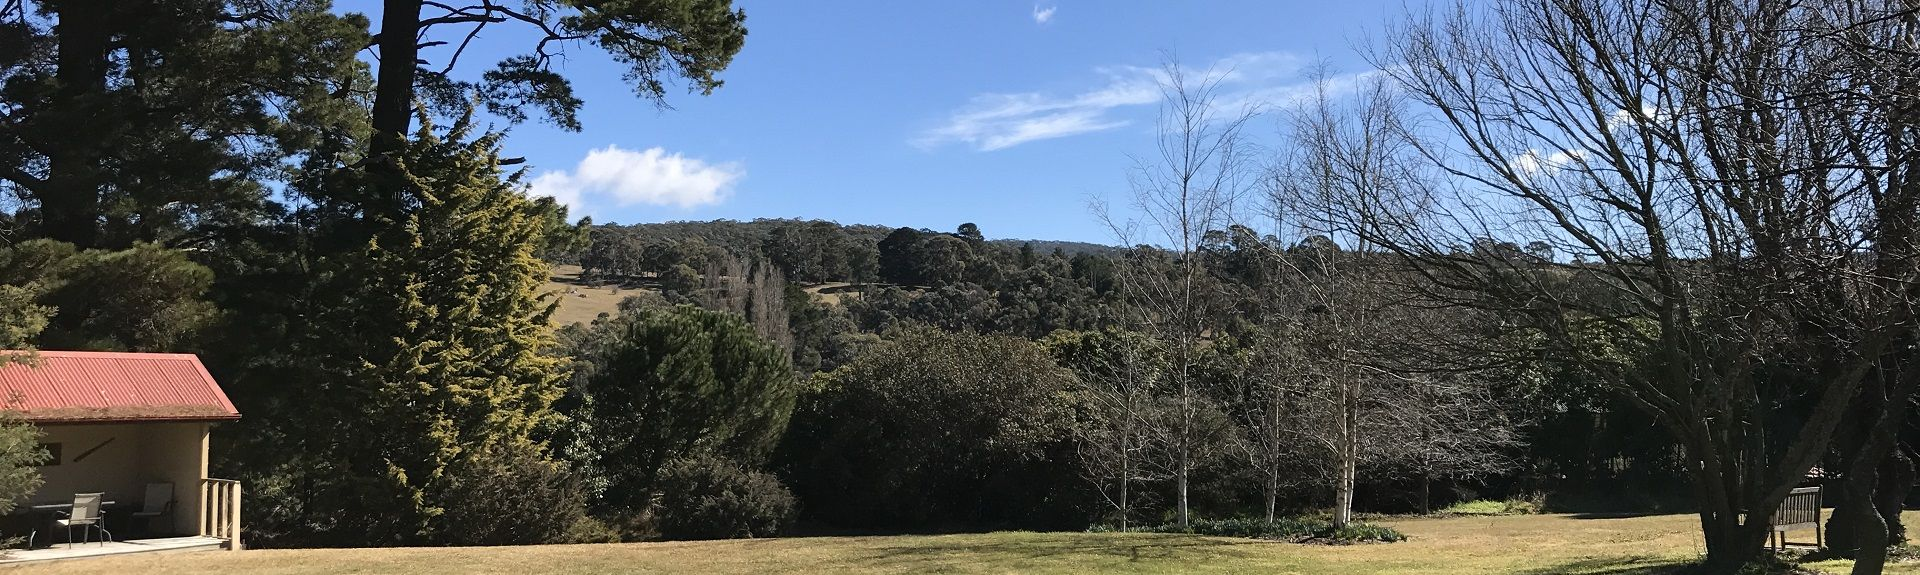 Bathurst Regional Council, New South Wales, Australia